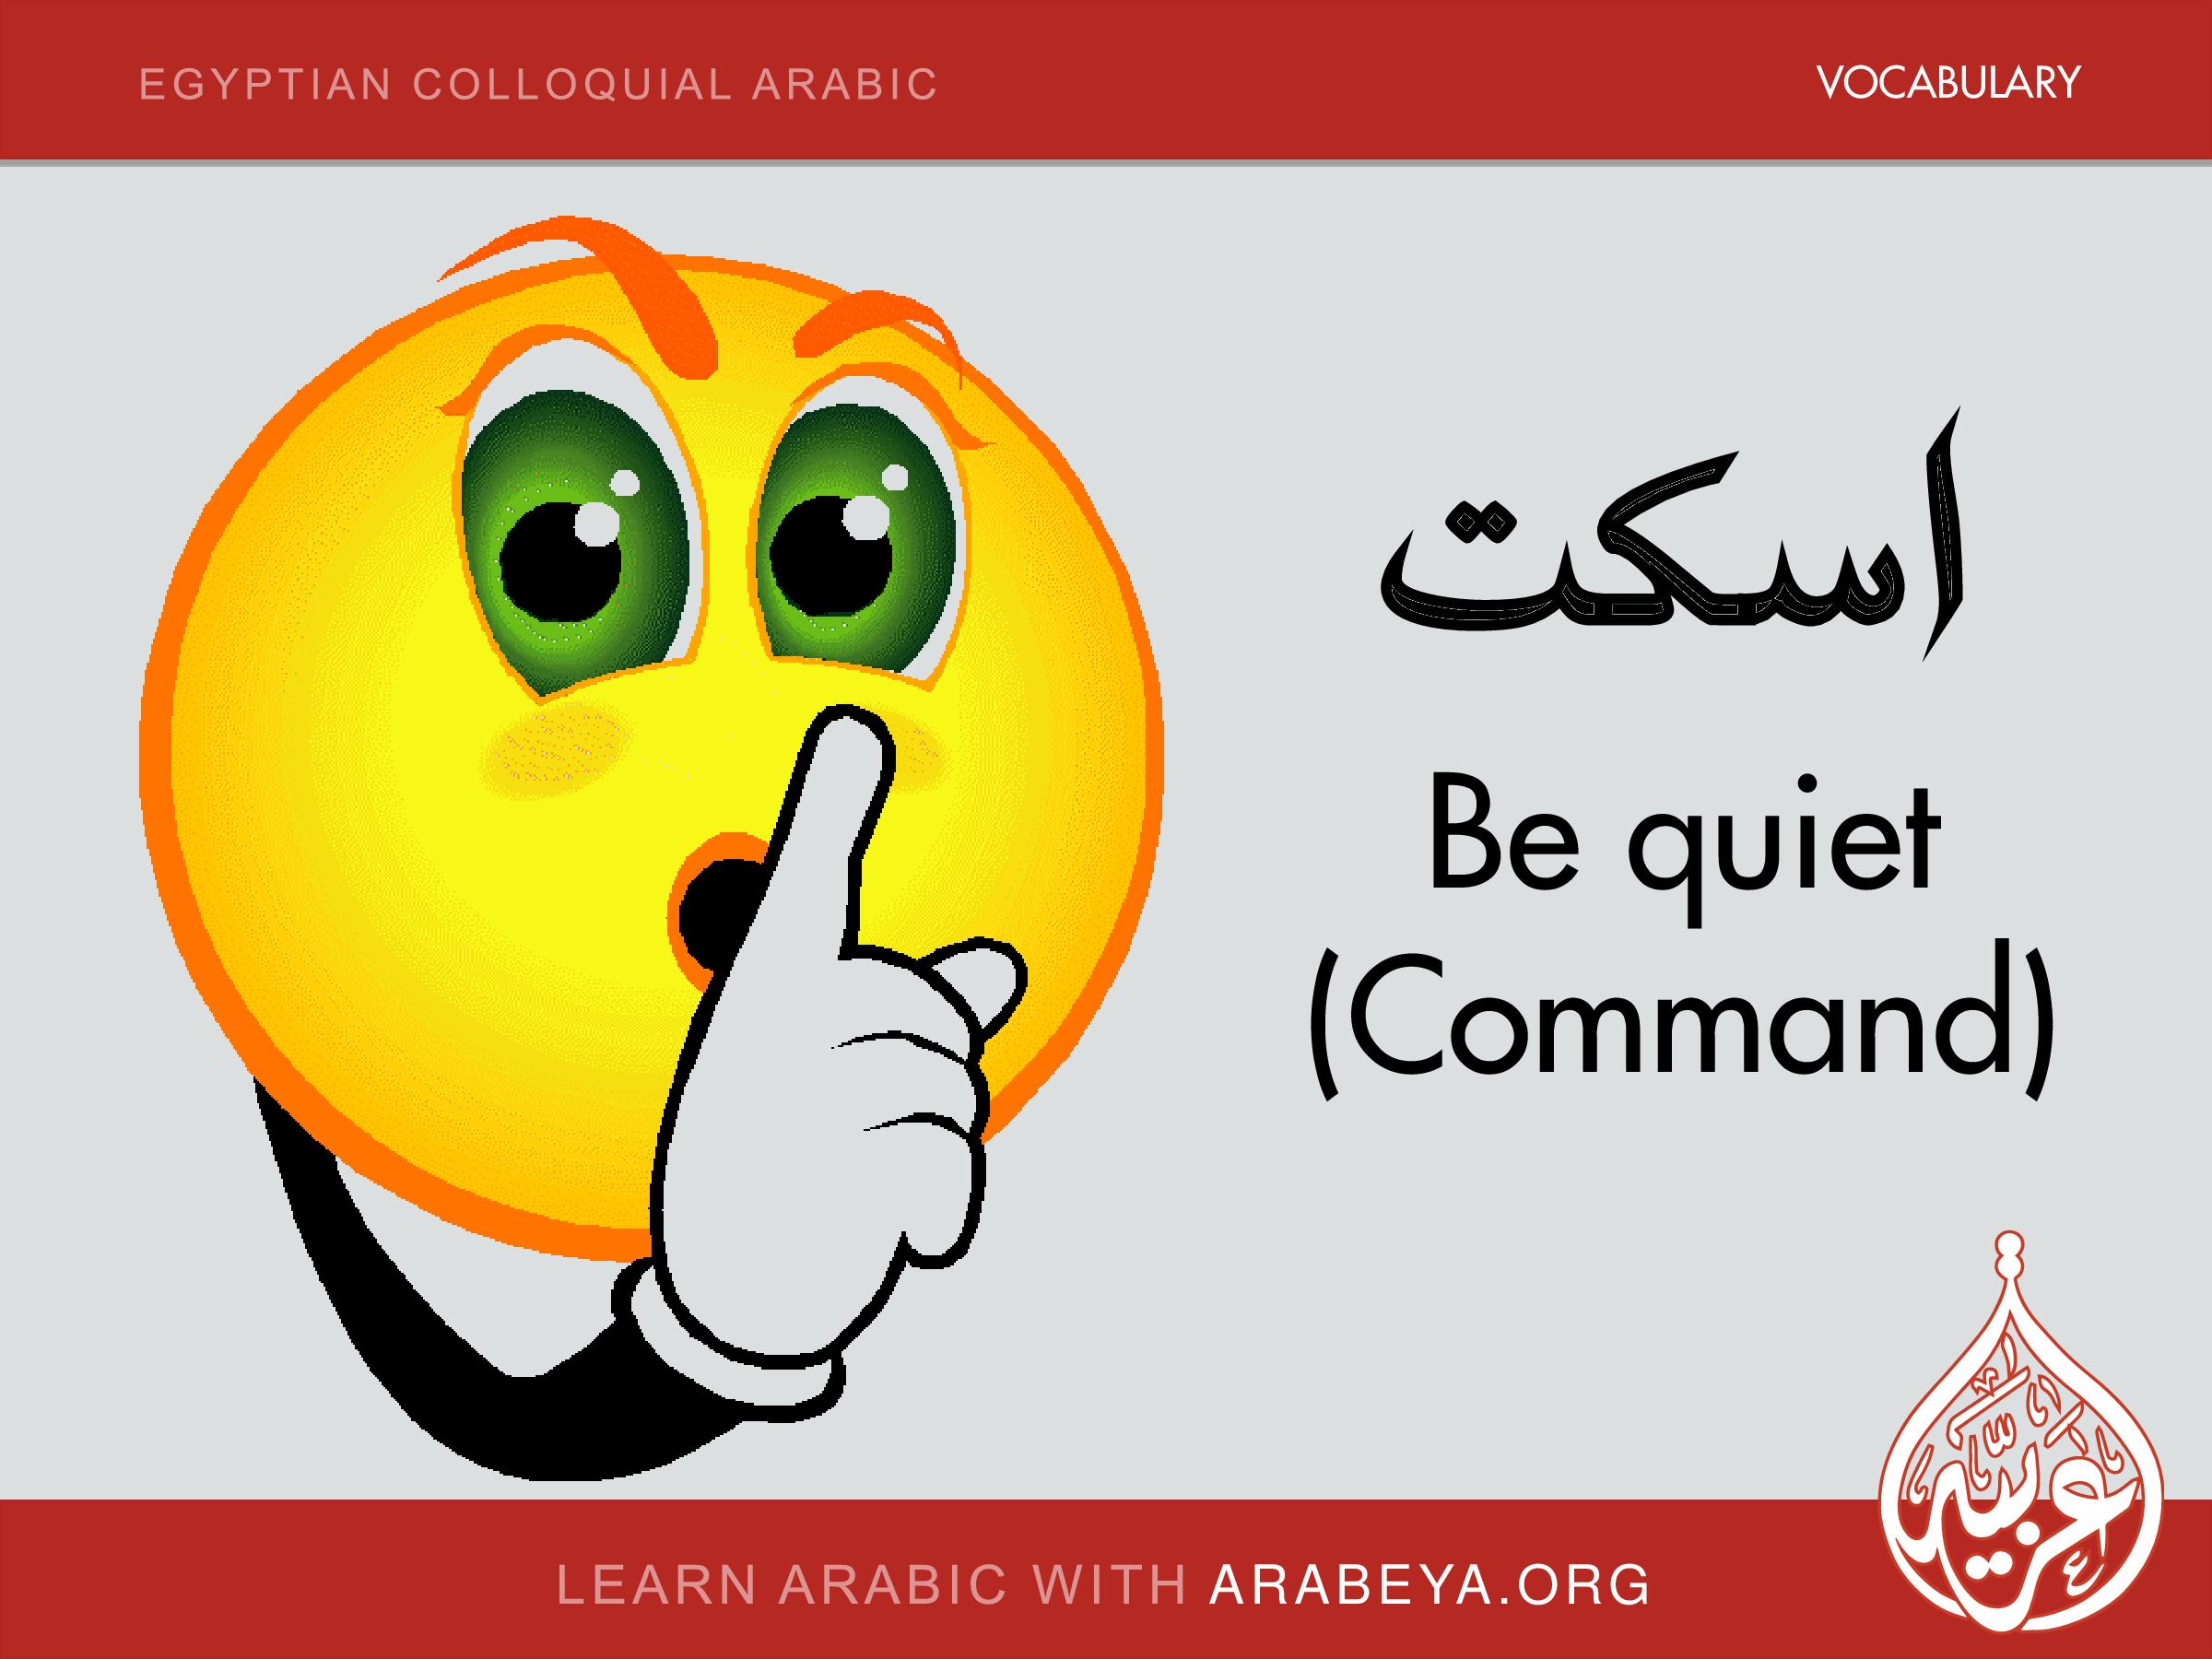 Be Quiet Command Learning Arabic Learn Arabic Language Learn Arabic Online